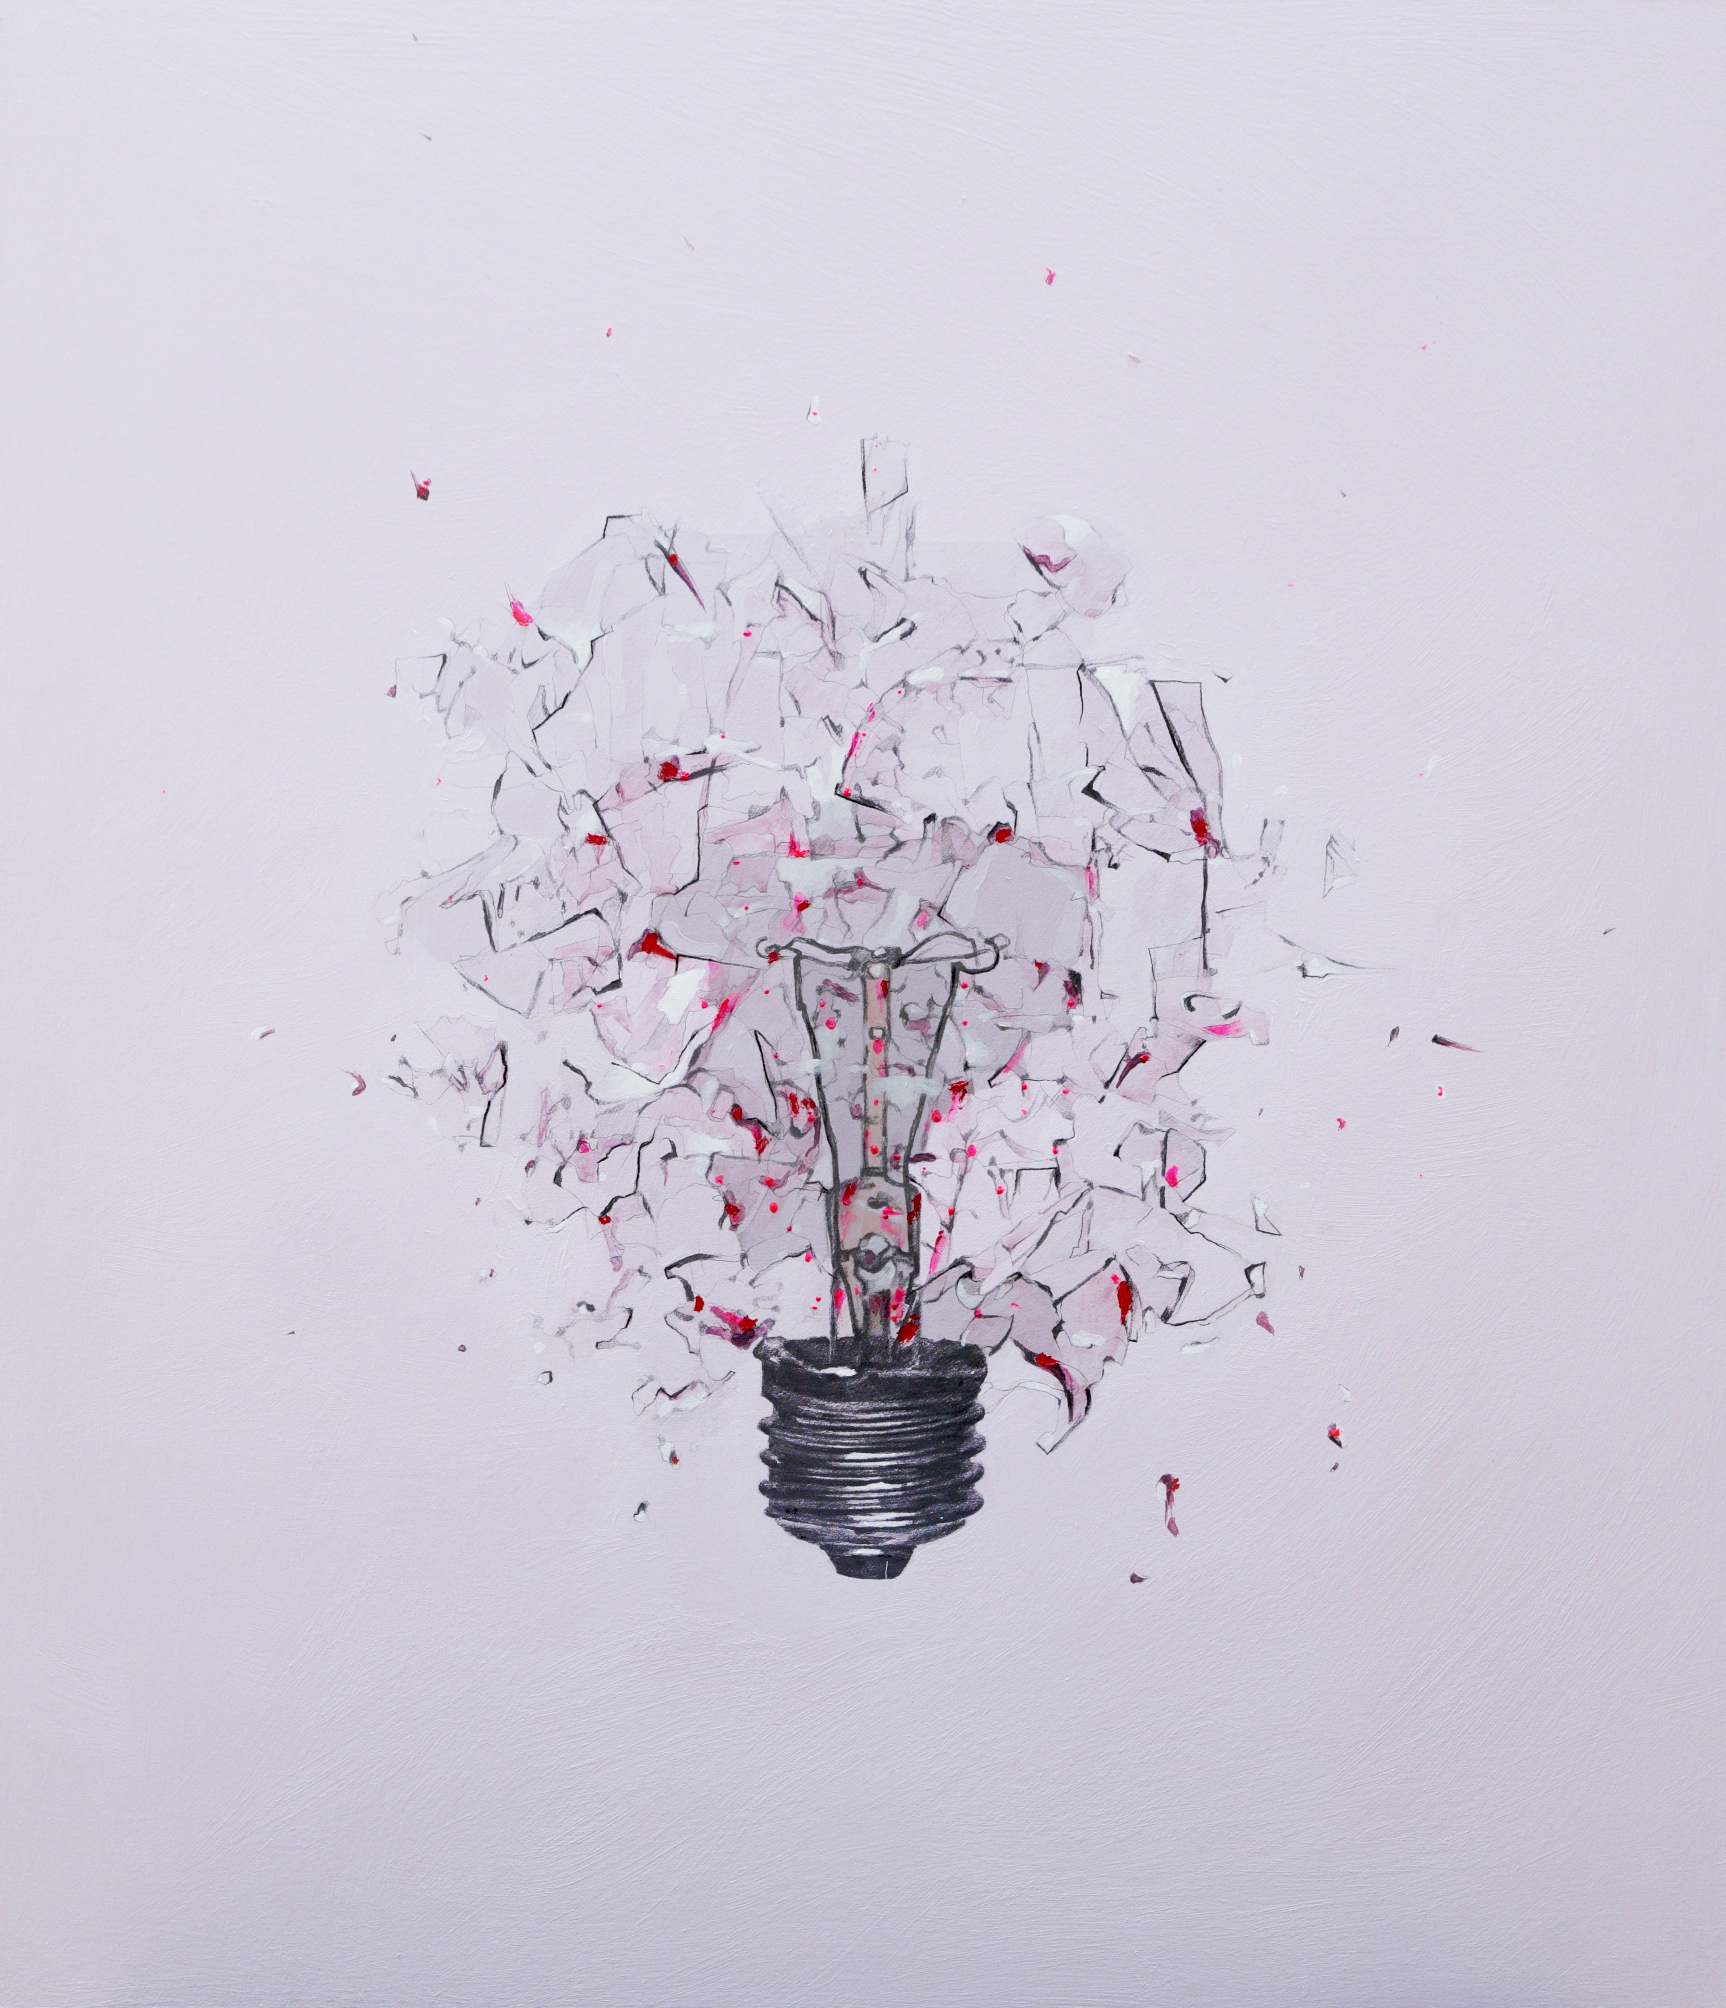 Ronan Walsh, Atomic, Acrylic & Pencil on Board, 81cm x 70cm x 2cm, http://www.ronanwalsh.co.uk